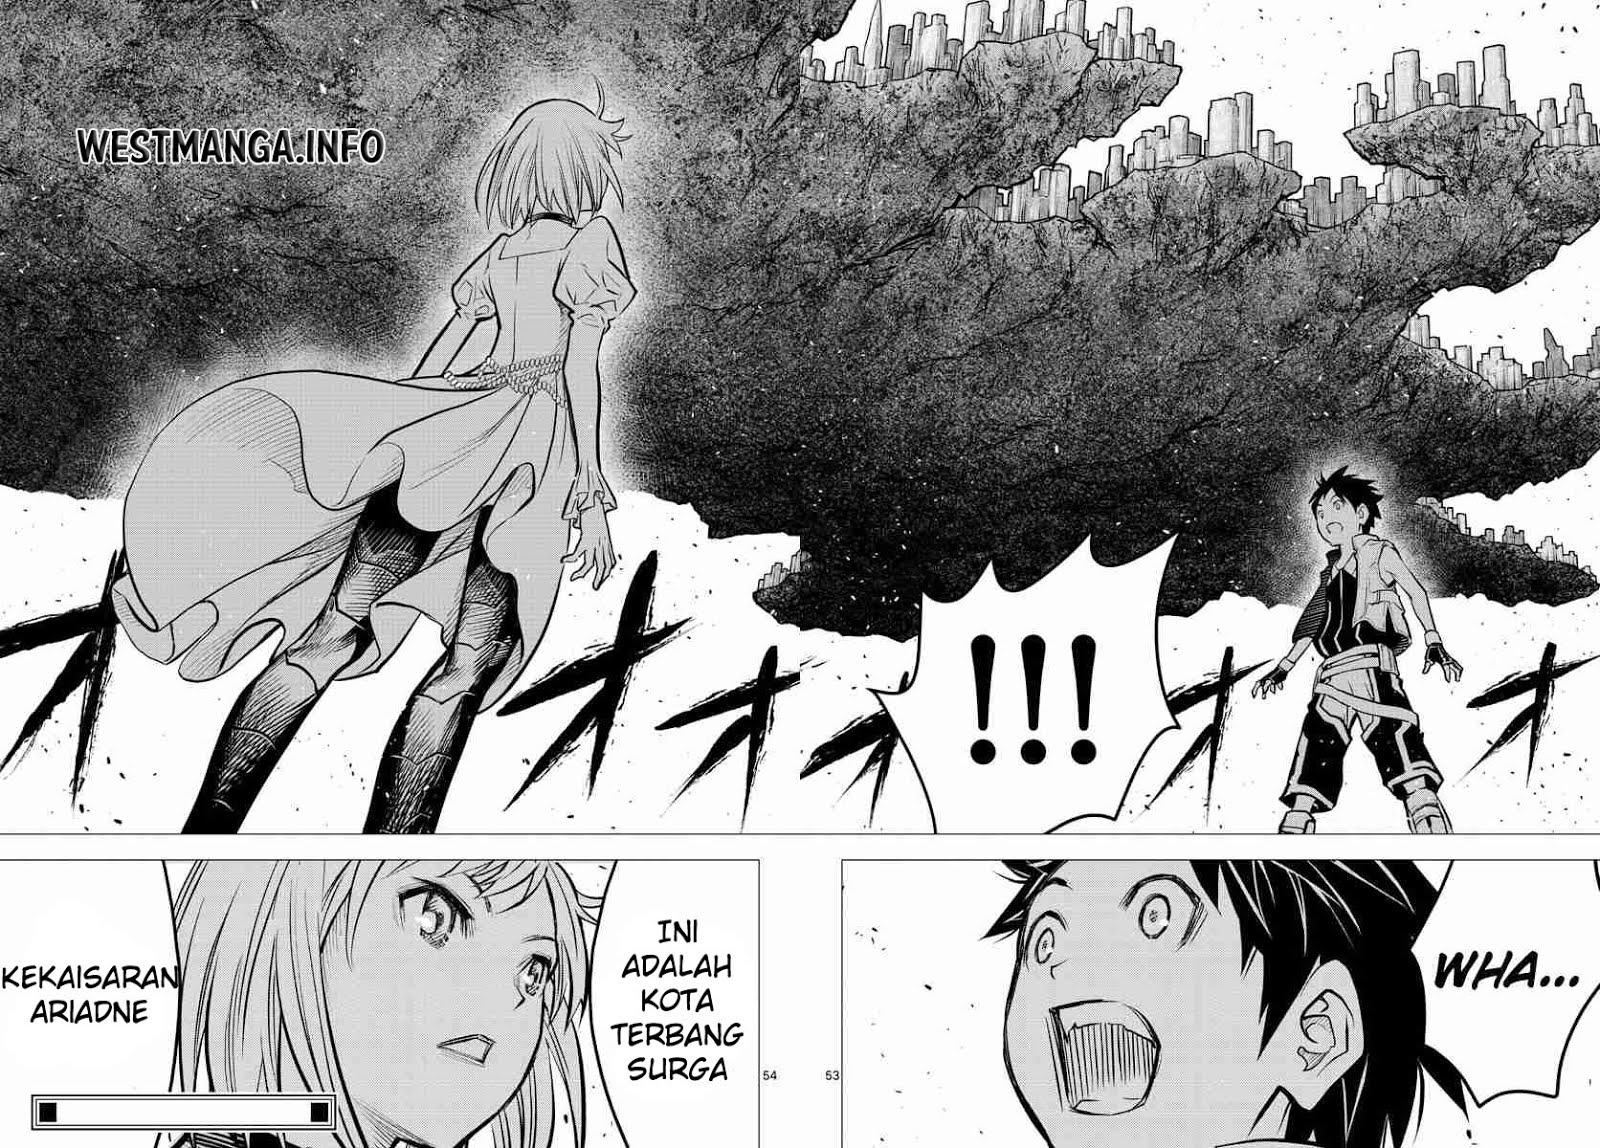 Komik soukyuu no ariadne 001 - chapter 1 2 Indonesia soukyuu no ariadne 001 - chapter 1 Terbaru 52|Baca Manga Komik Indonesia